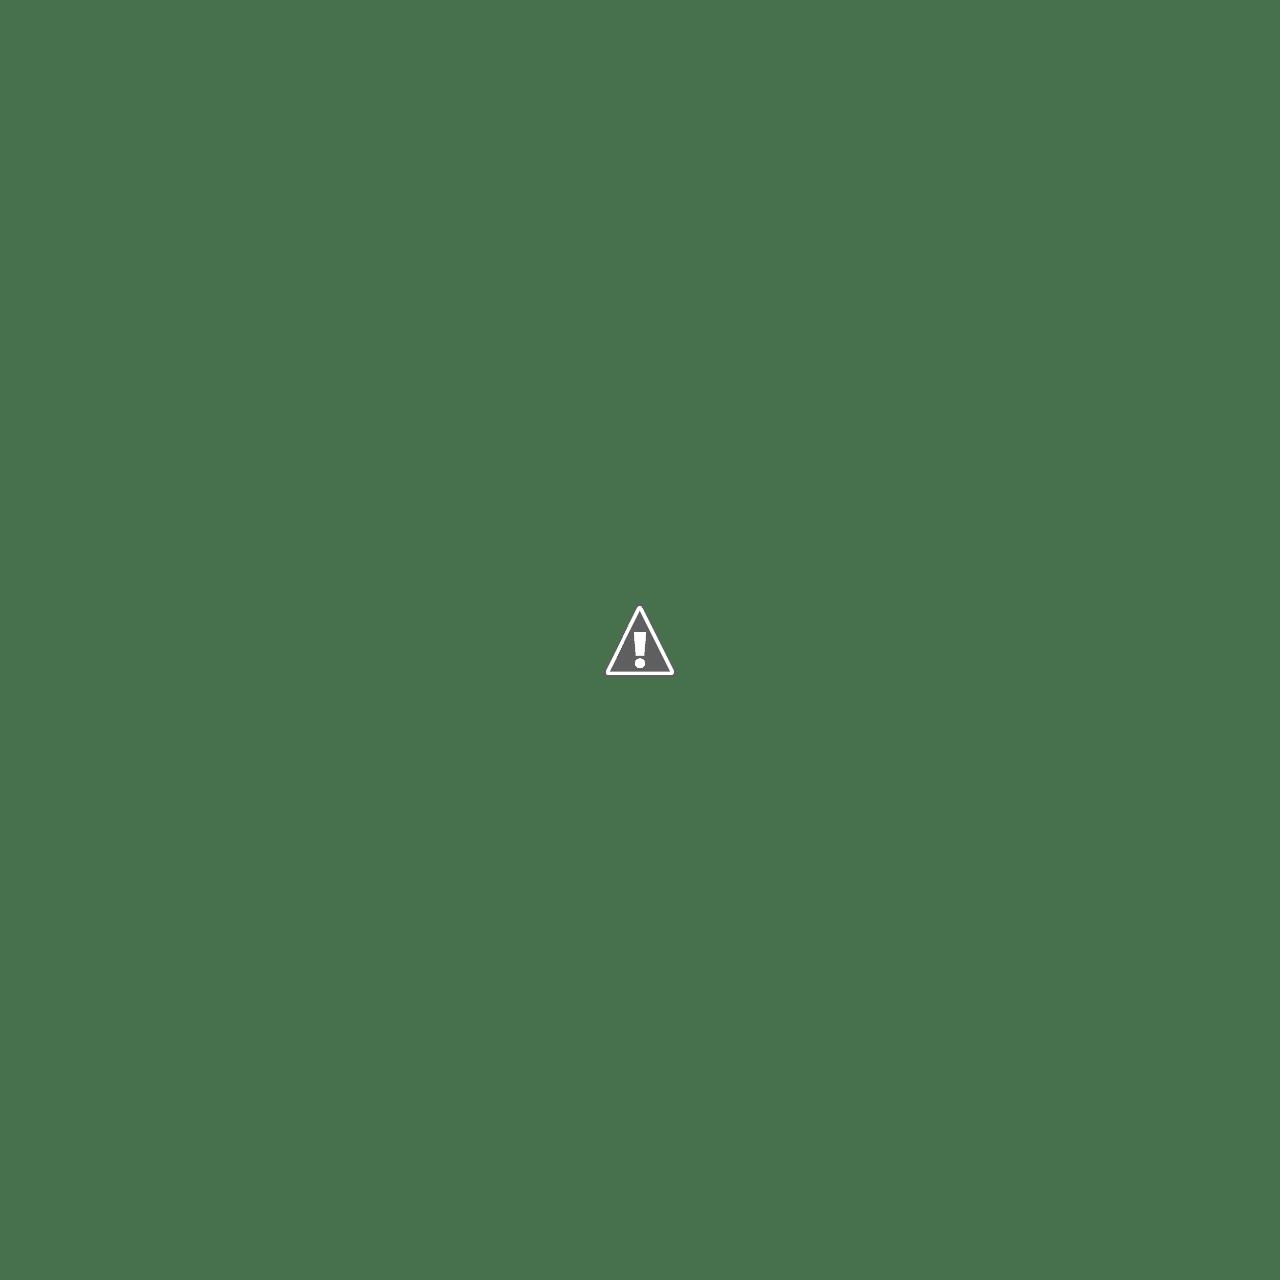 Royal Travel Bosnia And Herzegovina Tour Agency In Sarajevo